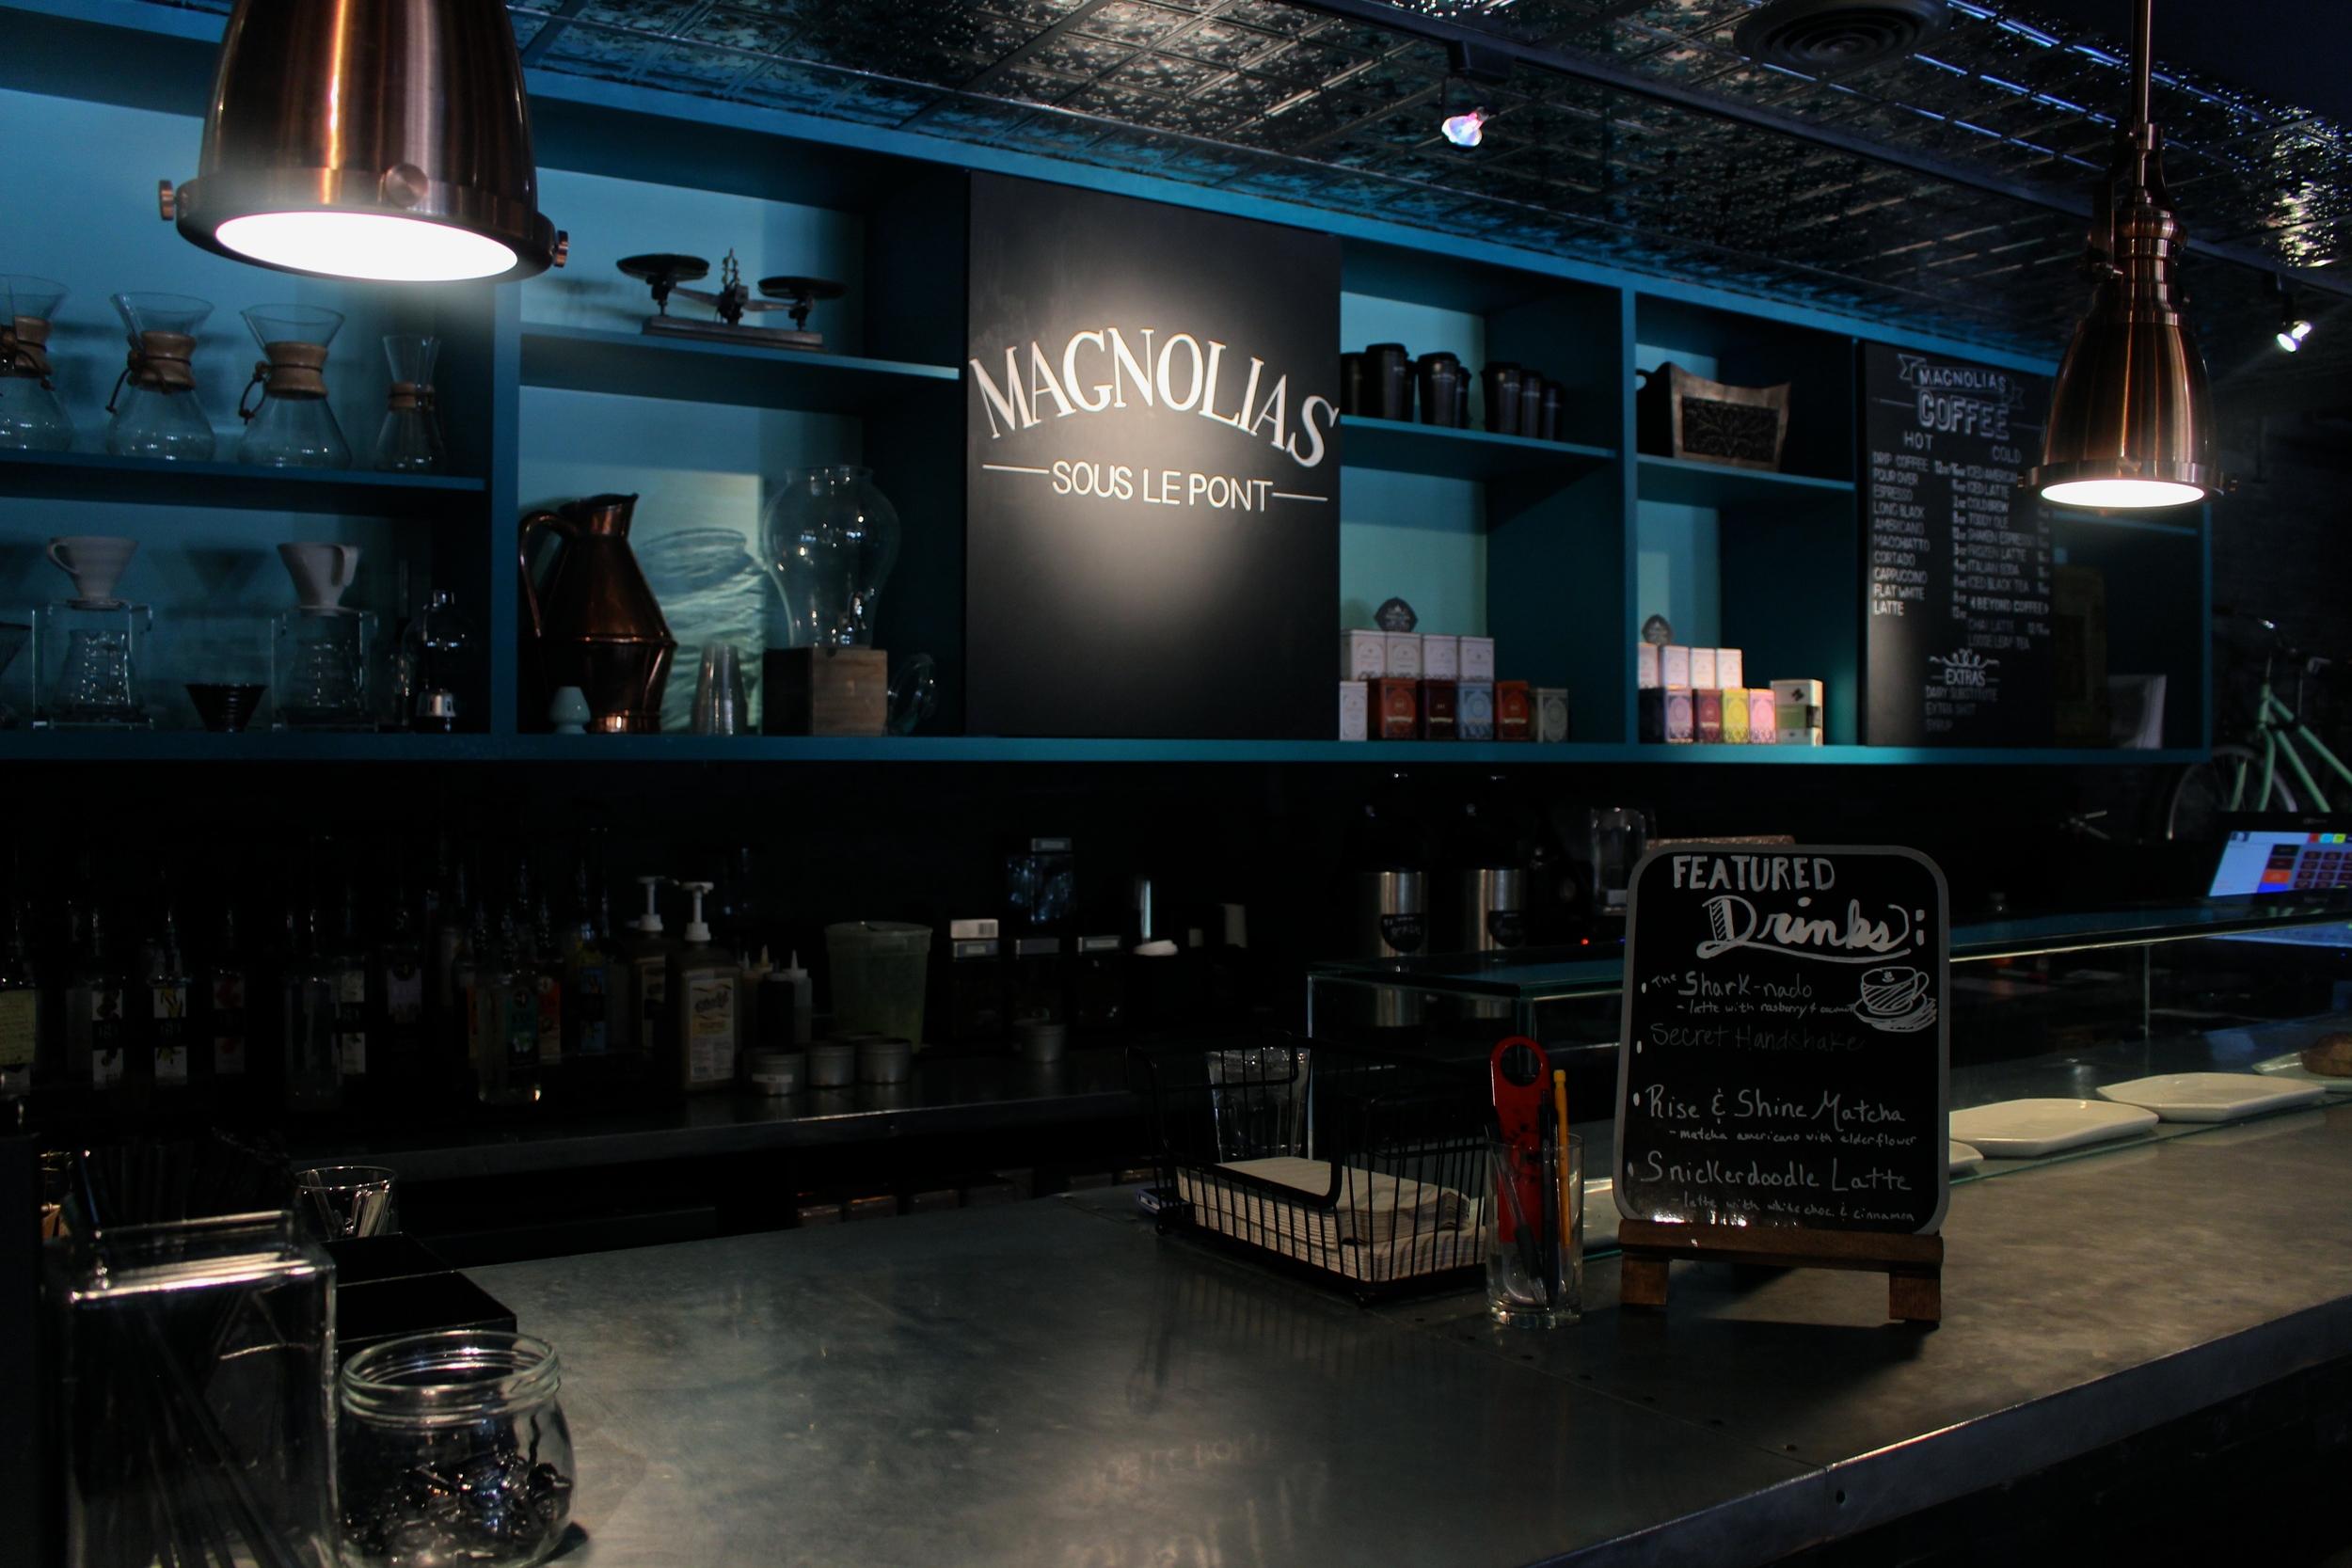 Dallas Coffee Shop Guide Magnolias Sous Le Pont by Miami blogger Zeinab kristen / Travel & lifestyle blogger